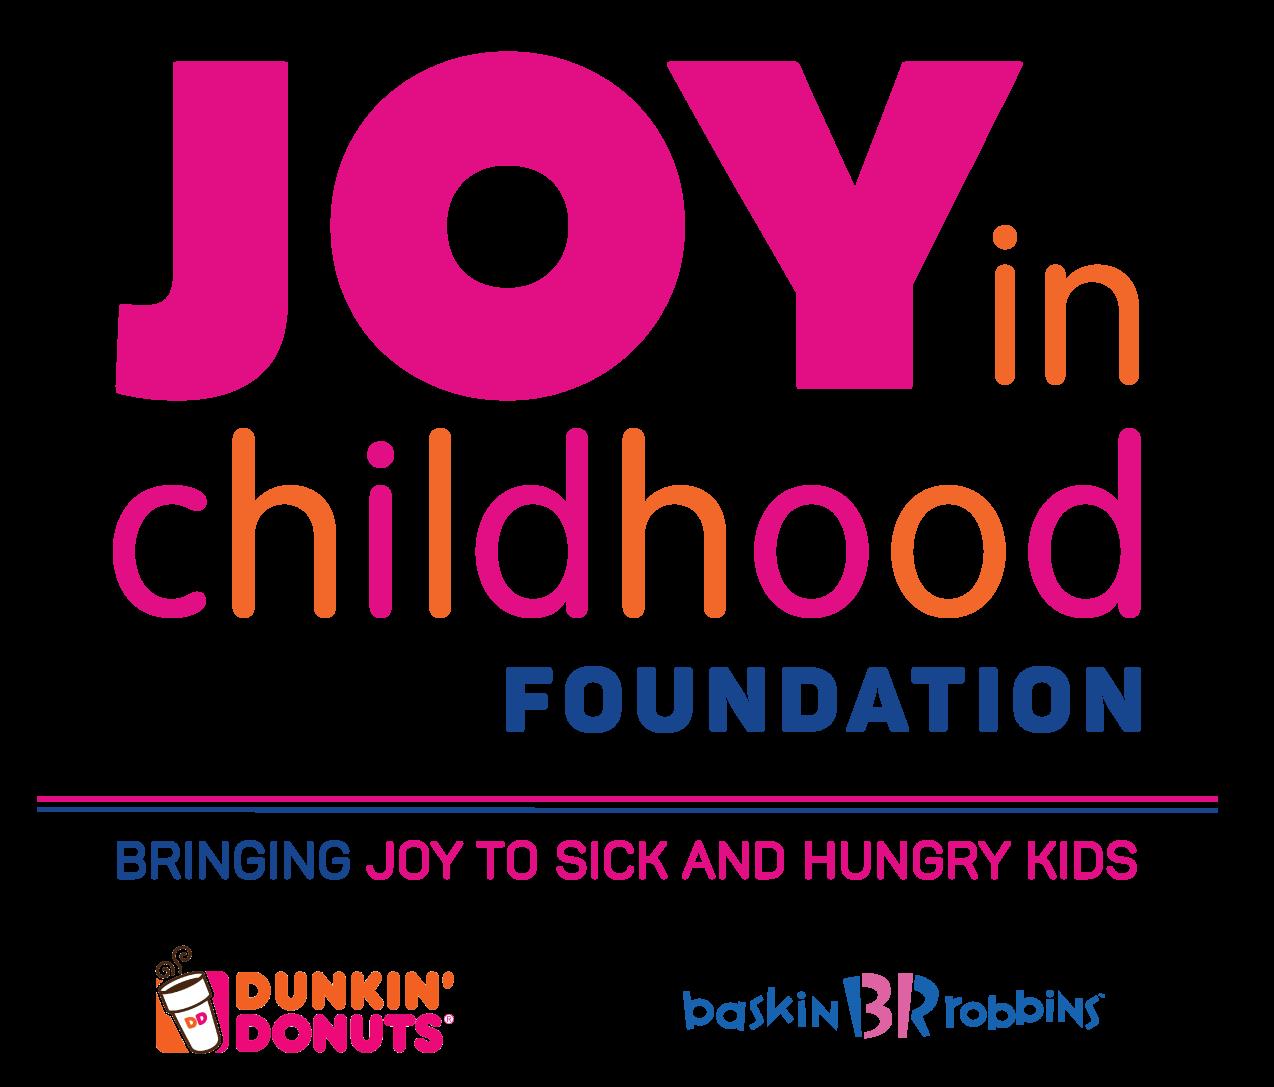 joy-in-childhood-foundation-logo3